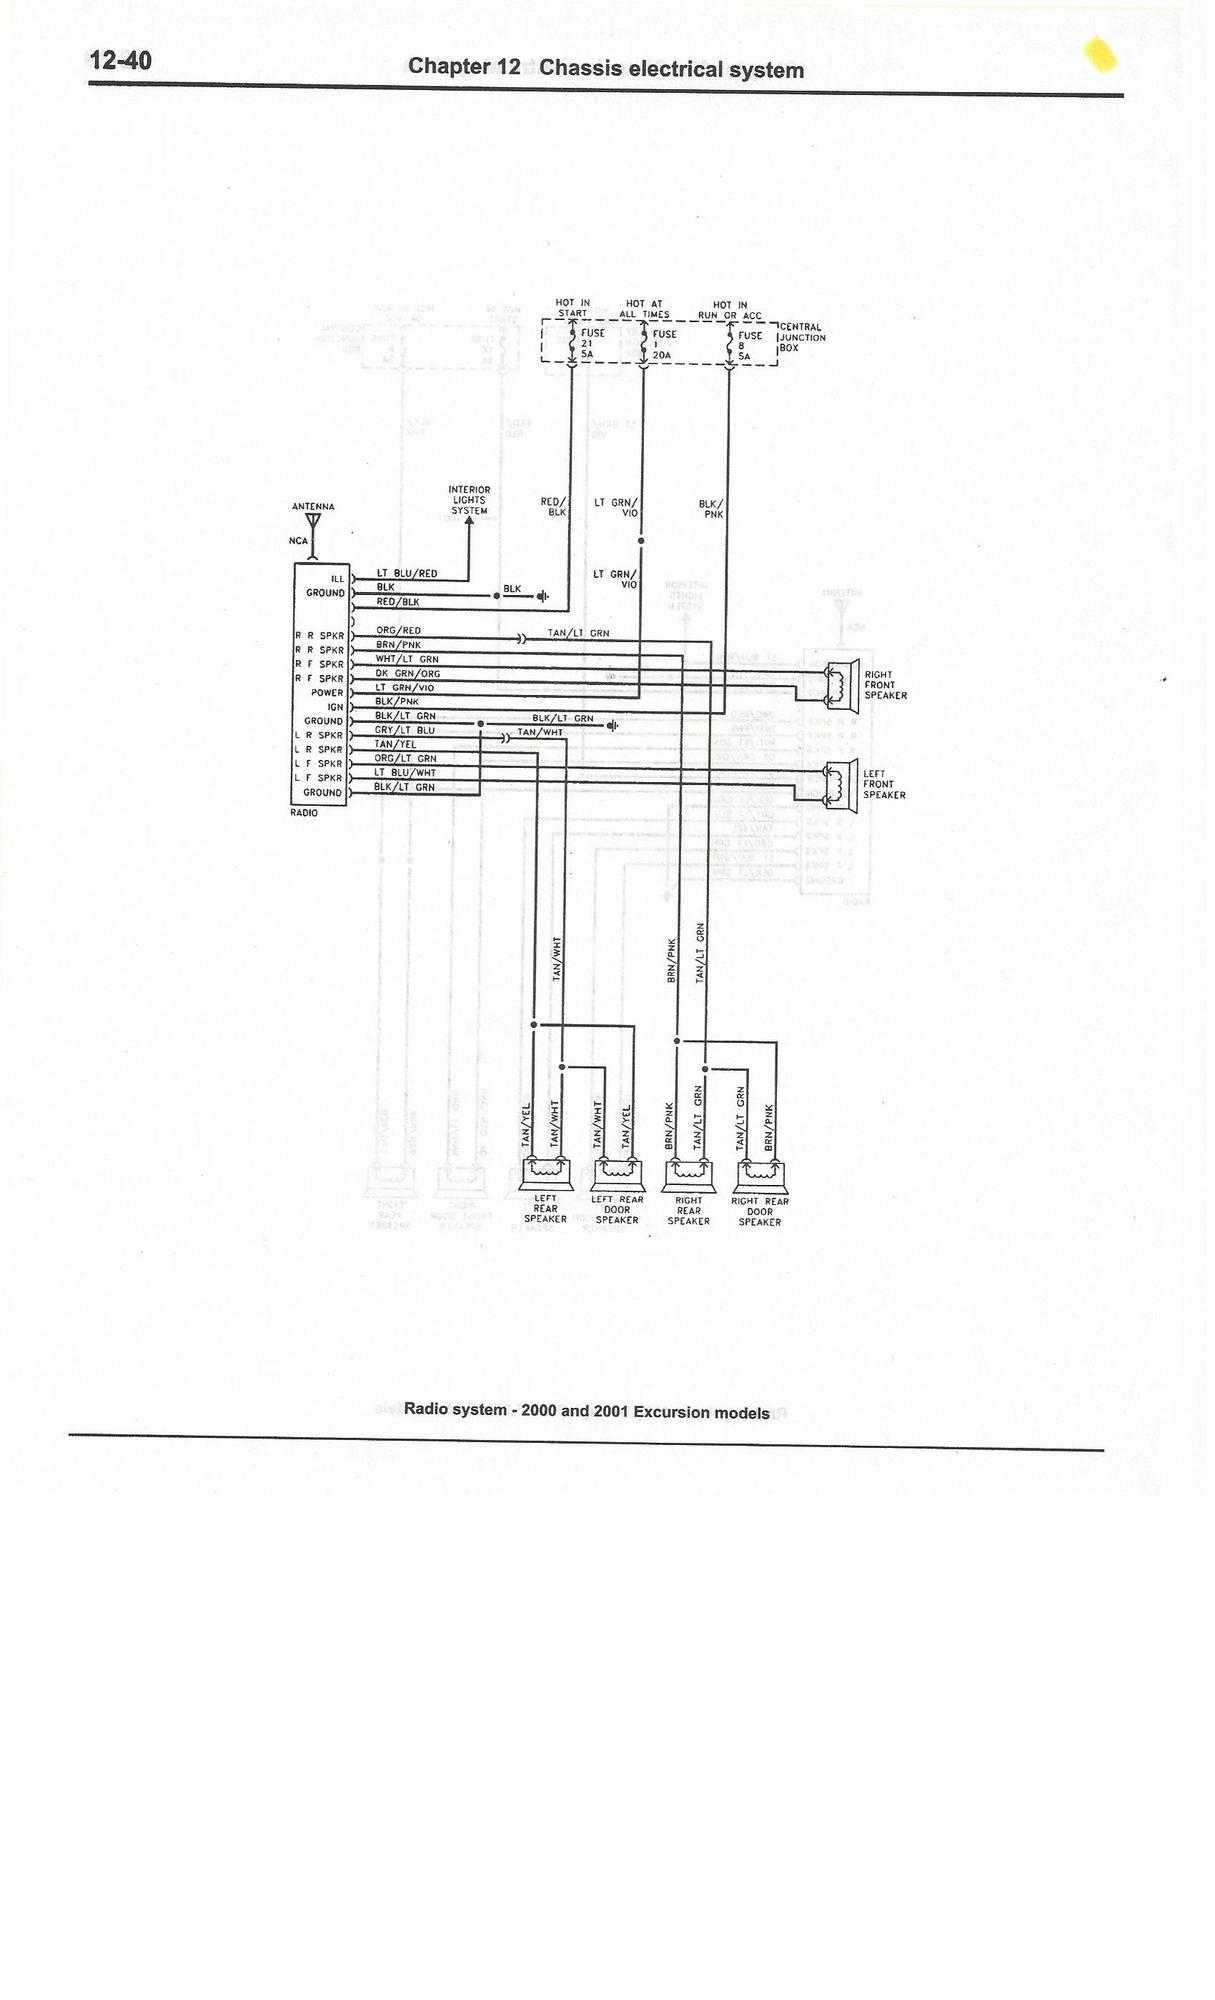 hight resolution of radio system 00 01 excursion